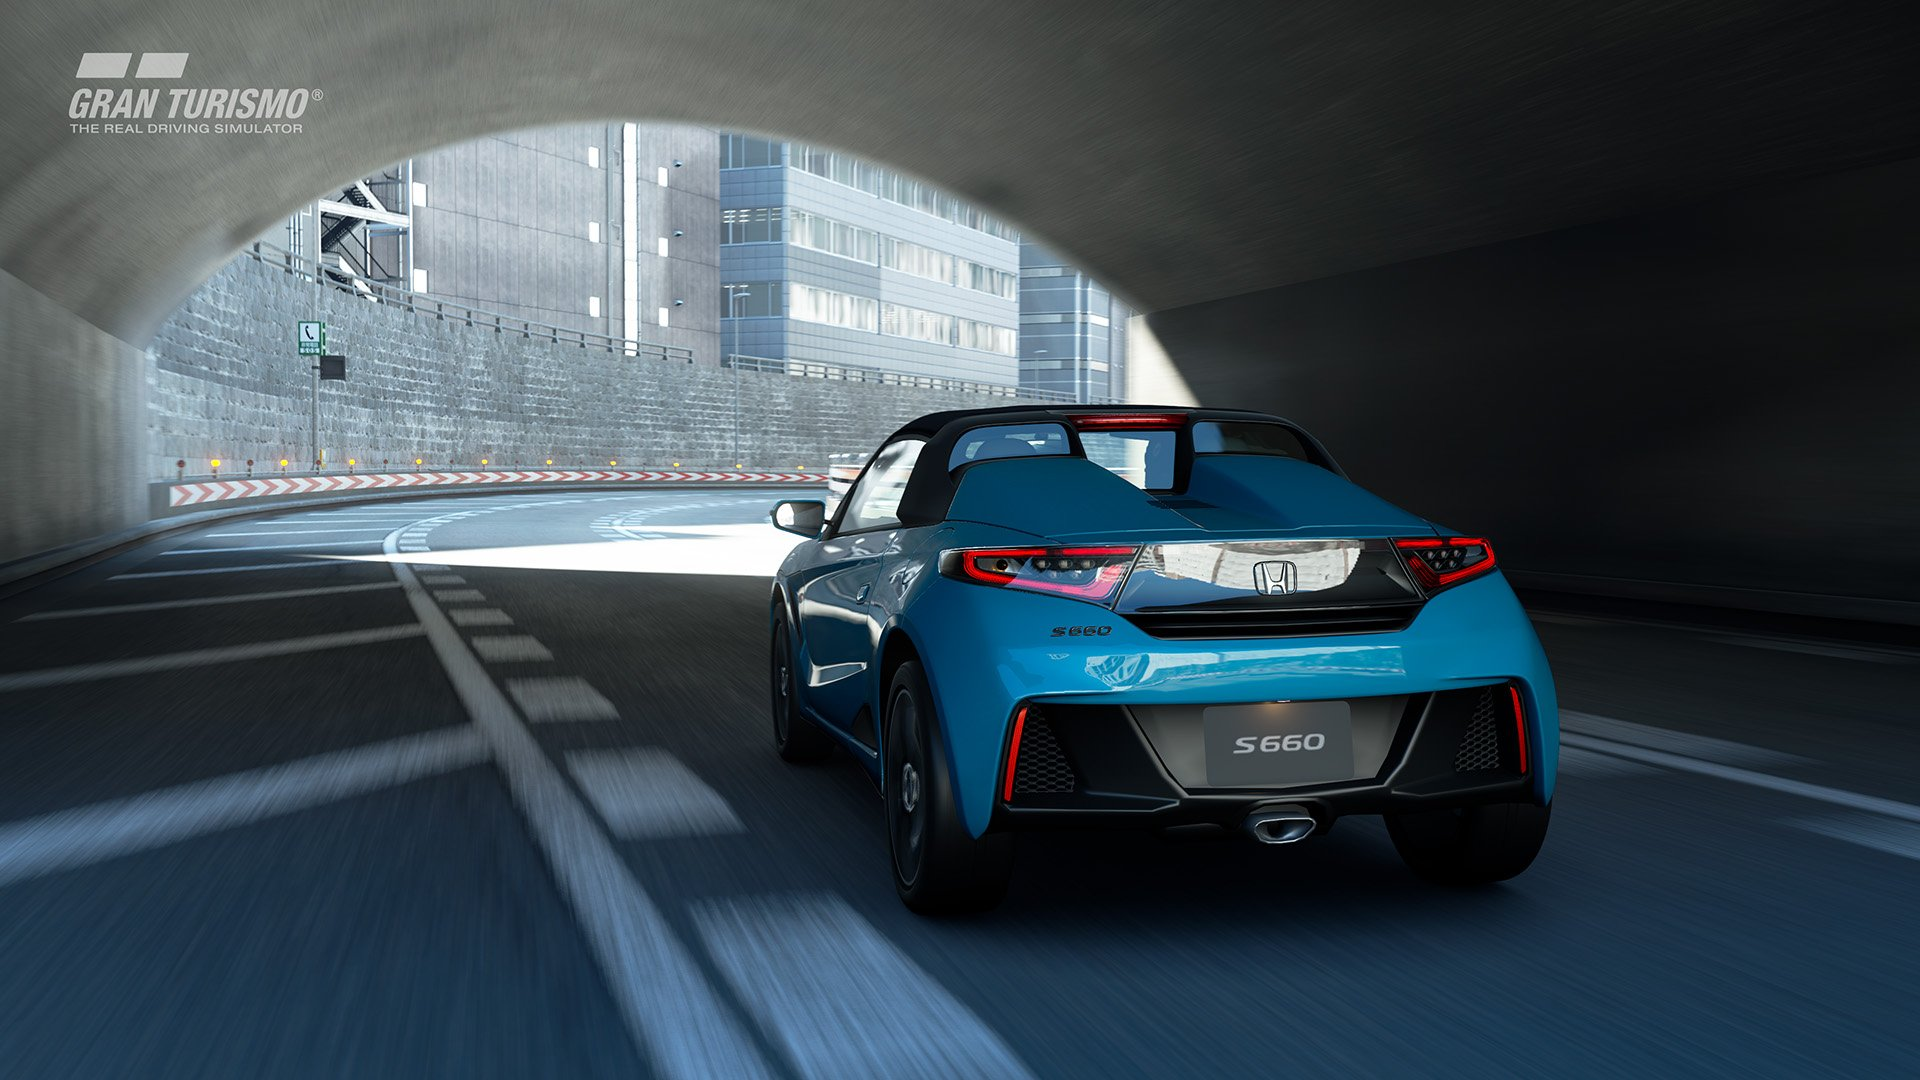 Gran Turismo Sport July update HONDA S660 '15 (N100) 4